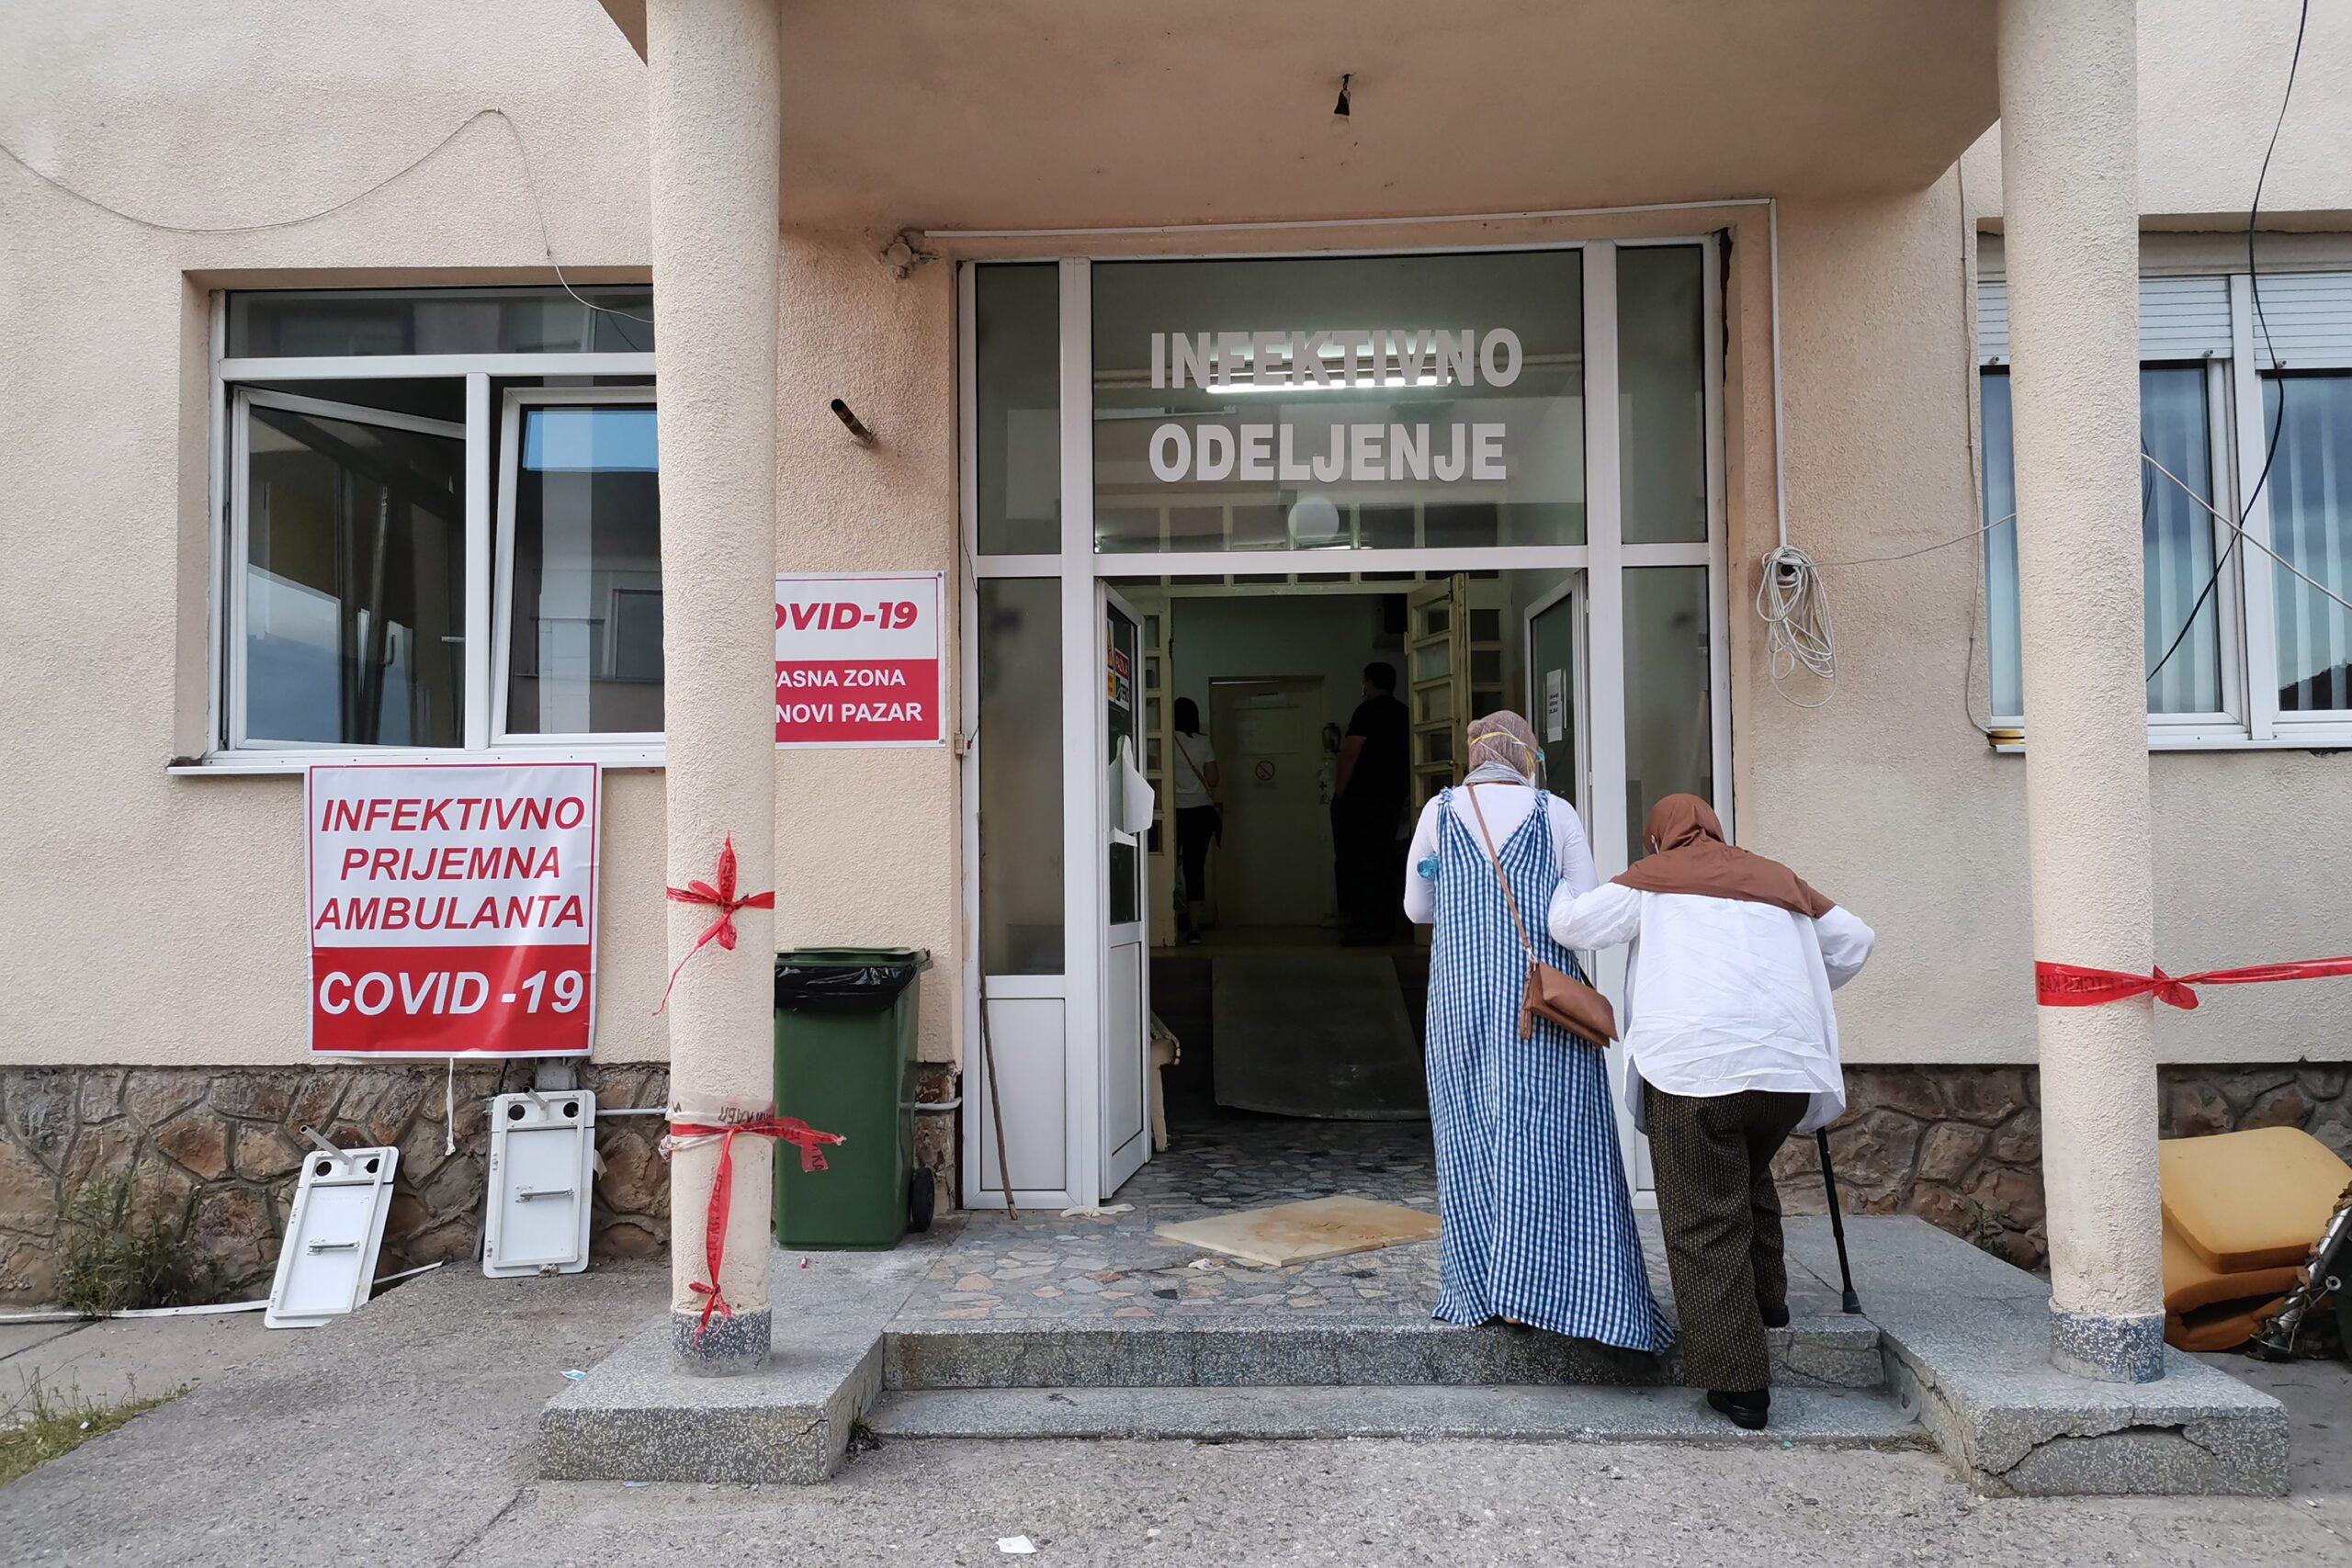 u-srbiji-214-novozarazenih,-preminule-dve-osobe